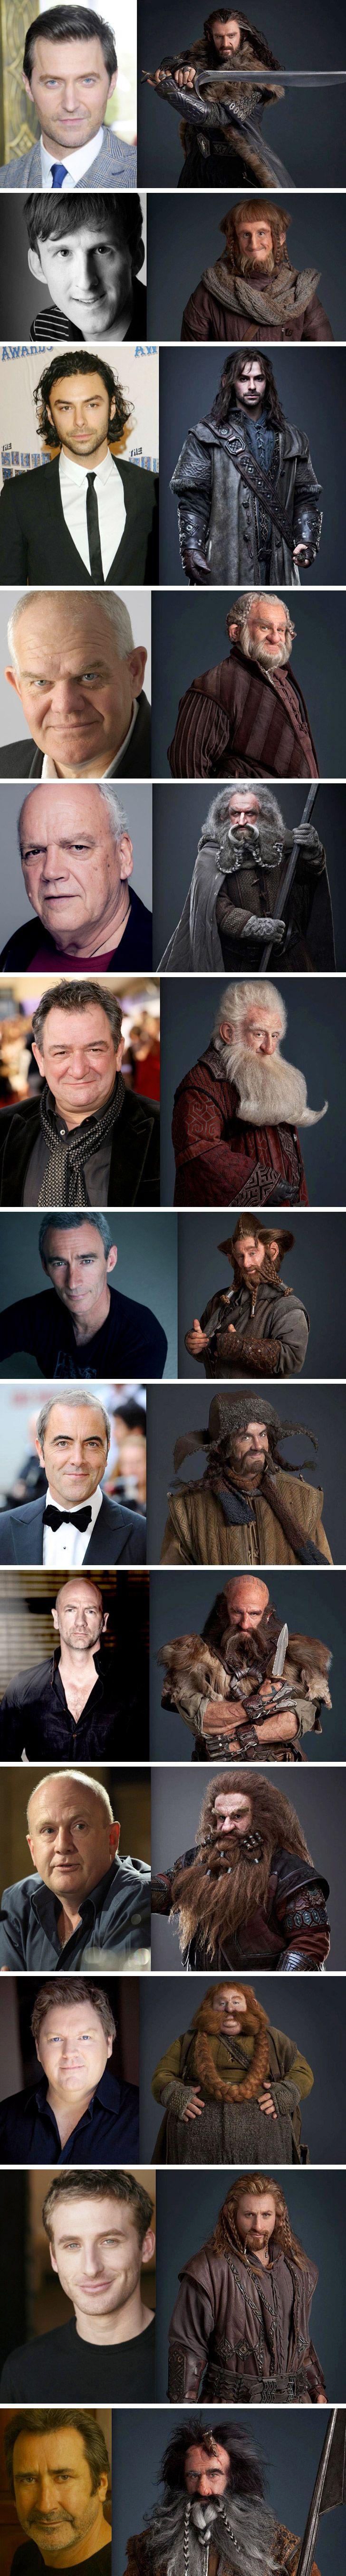 The Hobbit dwarves, pre and post make-up.  Richard Armitage as Thorin Oakenshield, Graham McTavish as Dwalin, Ken Stott as Balin, Aidan Turner as Kíli, Dean O'Gorman as Fíli, Mark Hadlow as Dori, Jed Brophy as Nori, Adam Brown as Ori, John Callen as Óin, Peter Hambleton as Glóin, William Kircher as Bifur, James Nesbitt as Bofur, Stephen Hunter as Bombur.